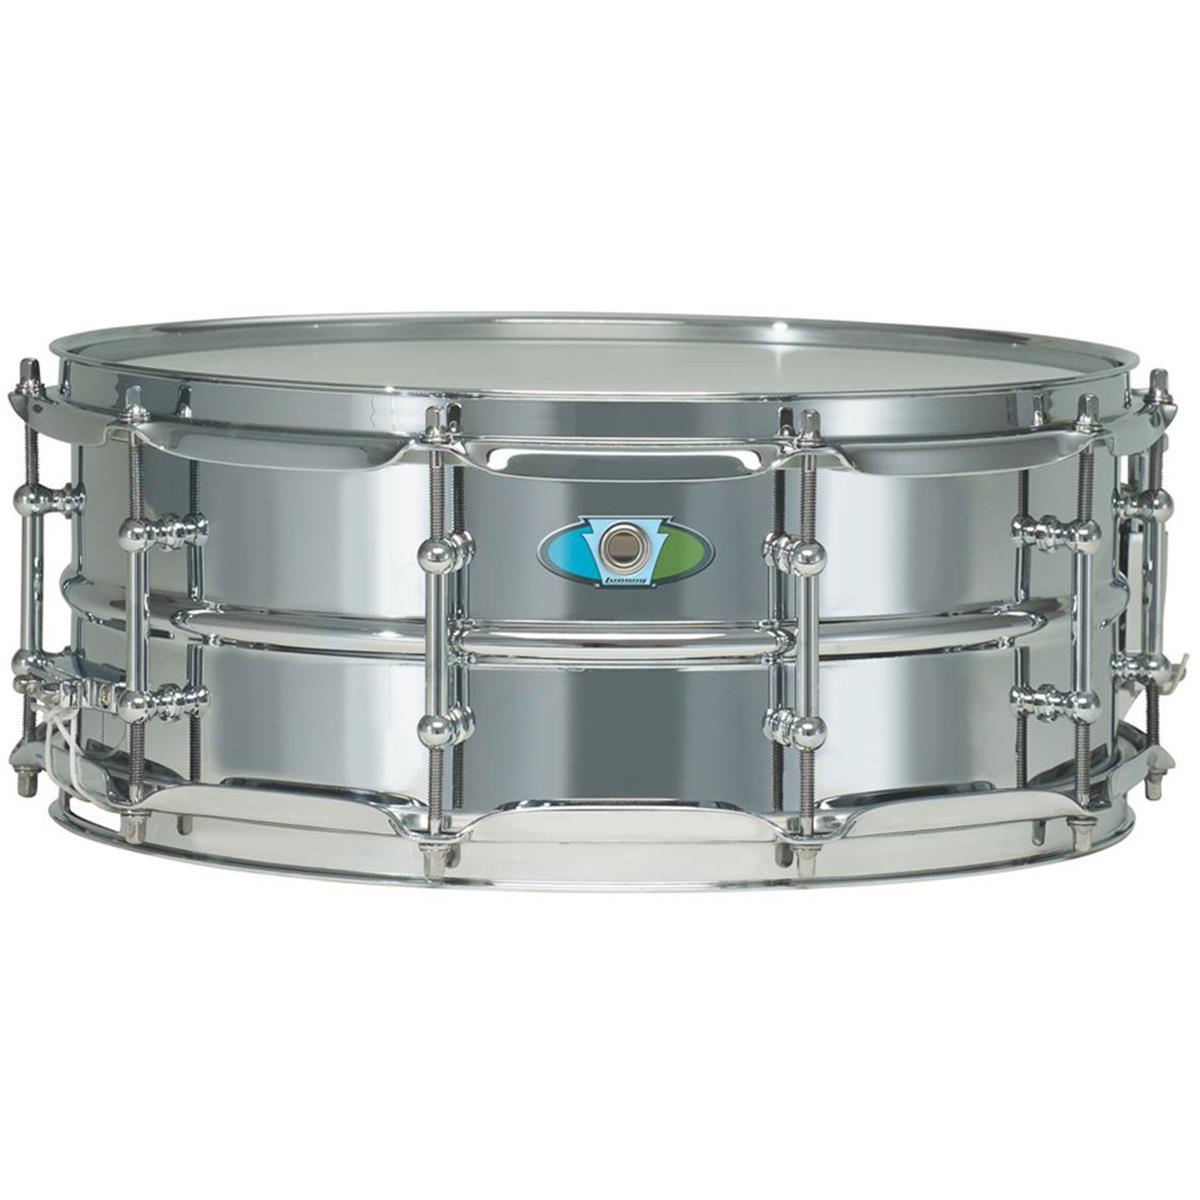 LUDWIG LW5514SL - Supralite rullante 5.5x14 acciaio - Batterie / Percussioni Batterie - Batterie Acustiche (set)